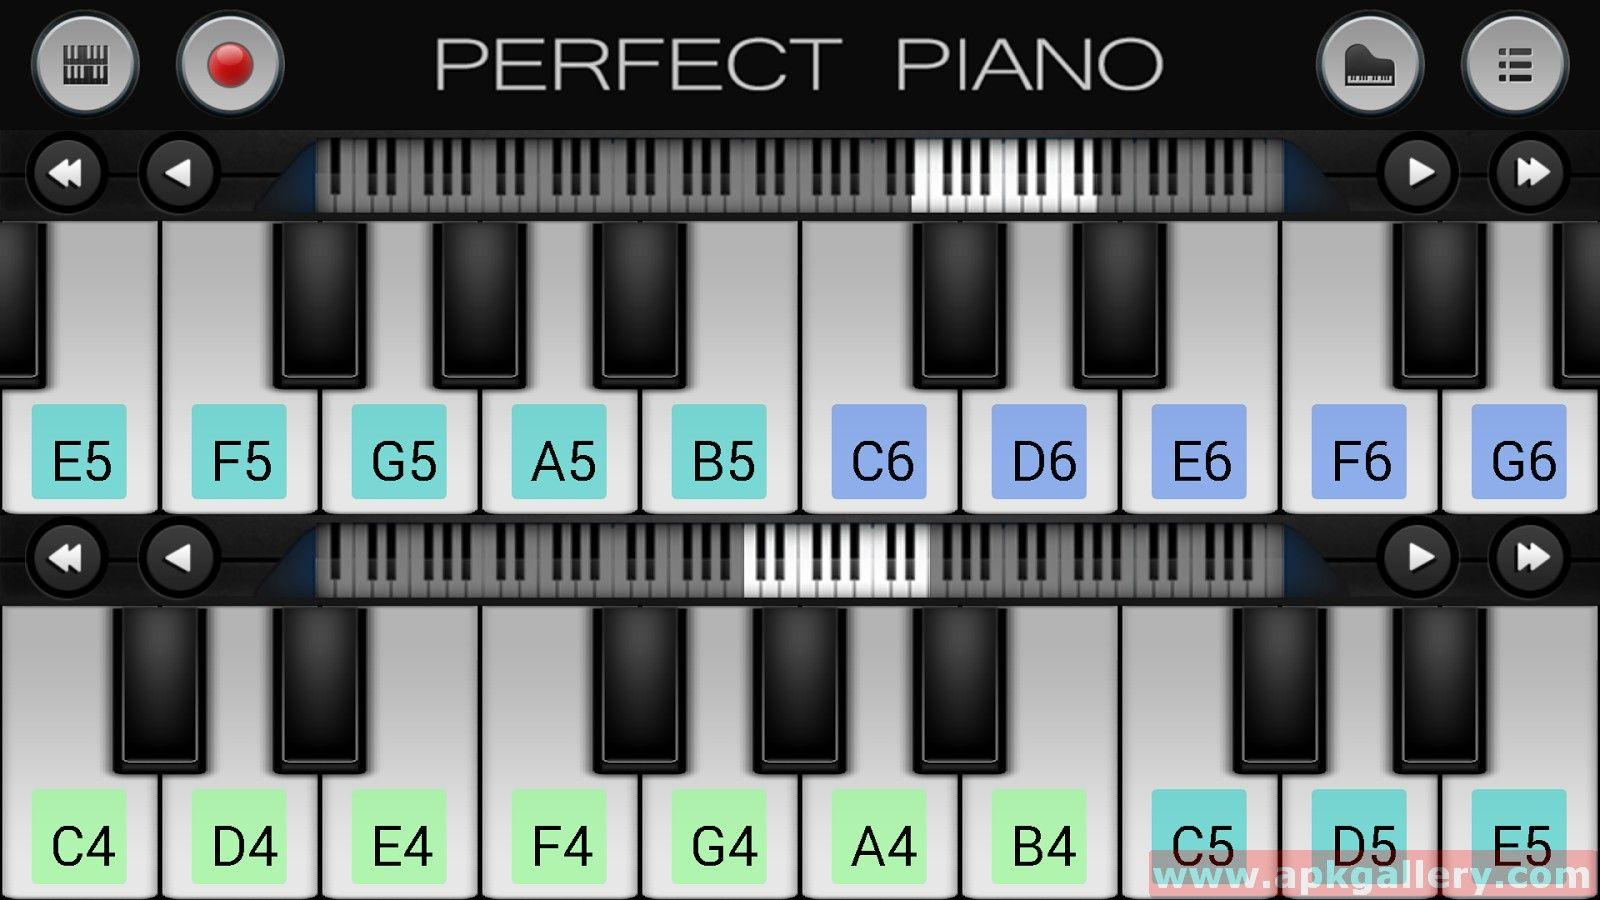 Pin by Gerard Santos on APK | Piano, Midi keyboard, 88 key piano